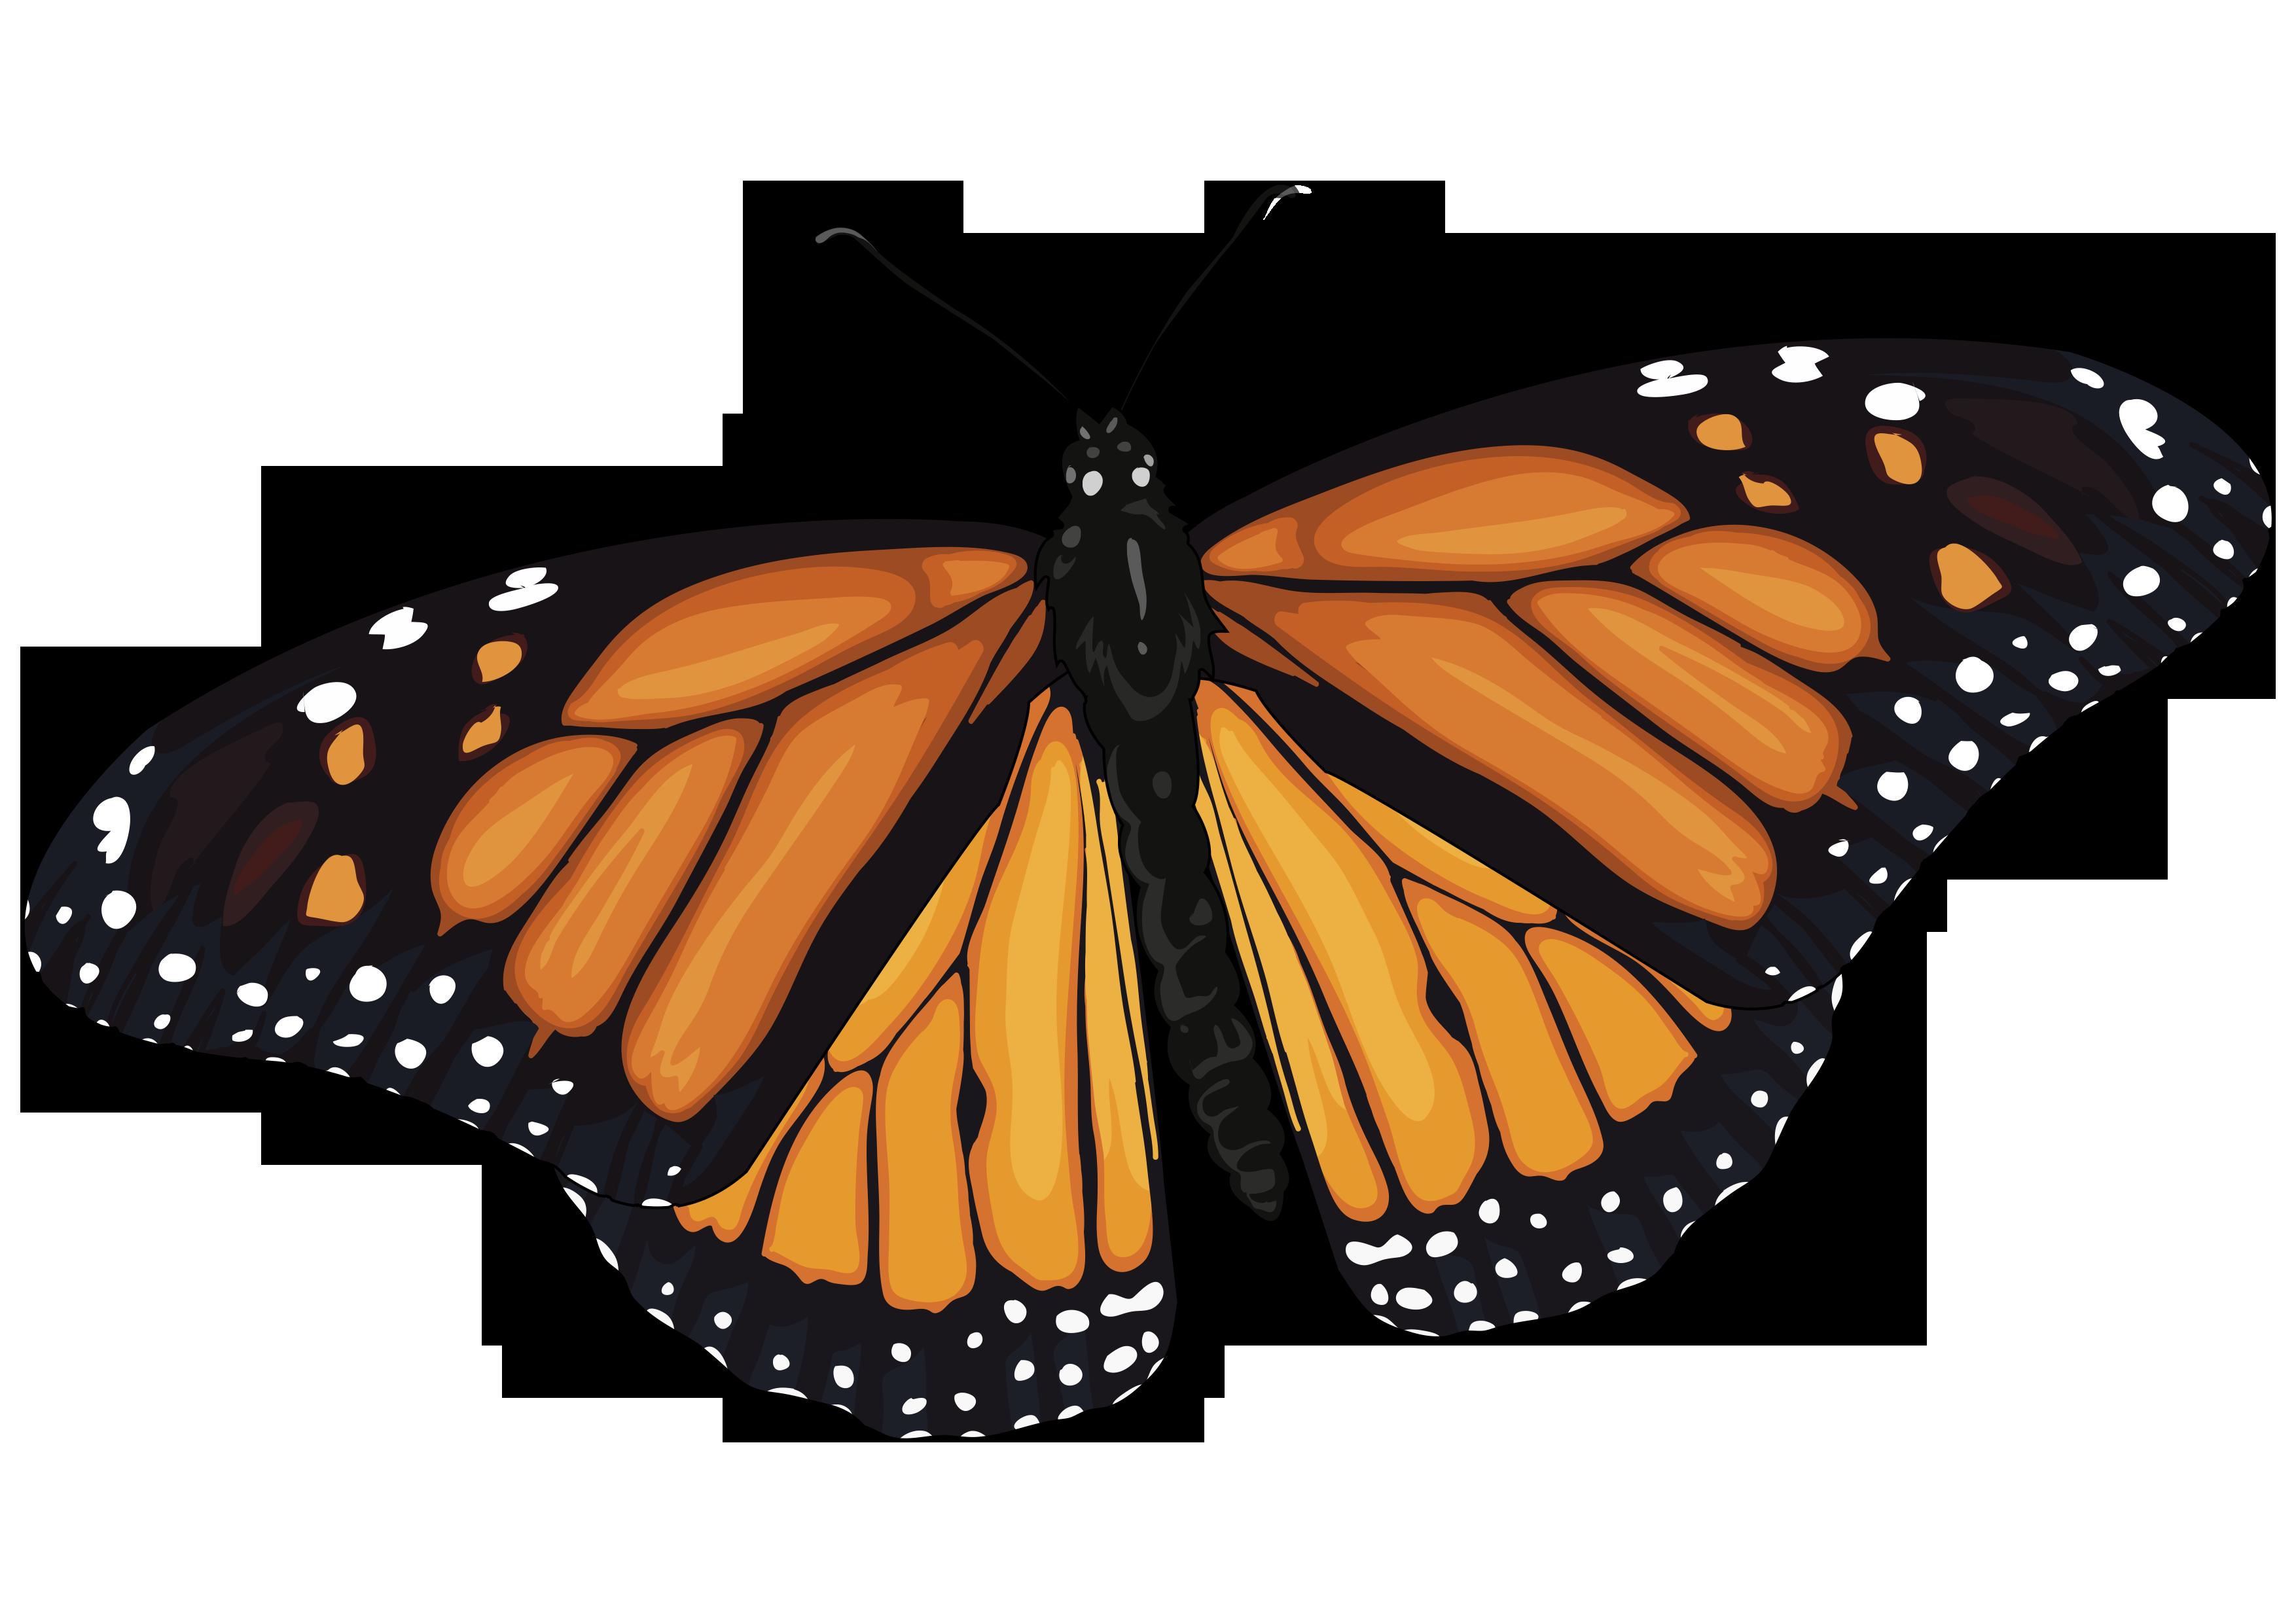 Lámina: Mariposas » Recursos educativos digitales